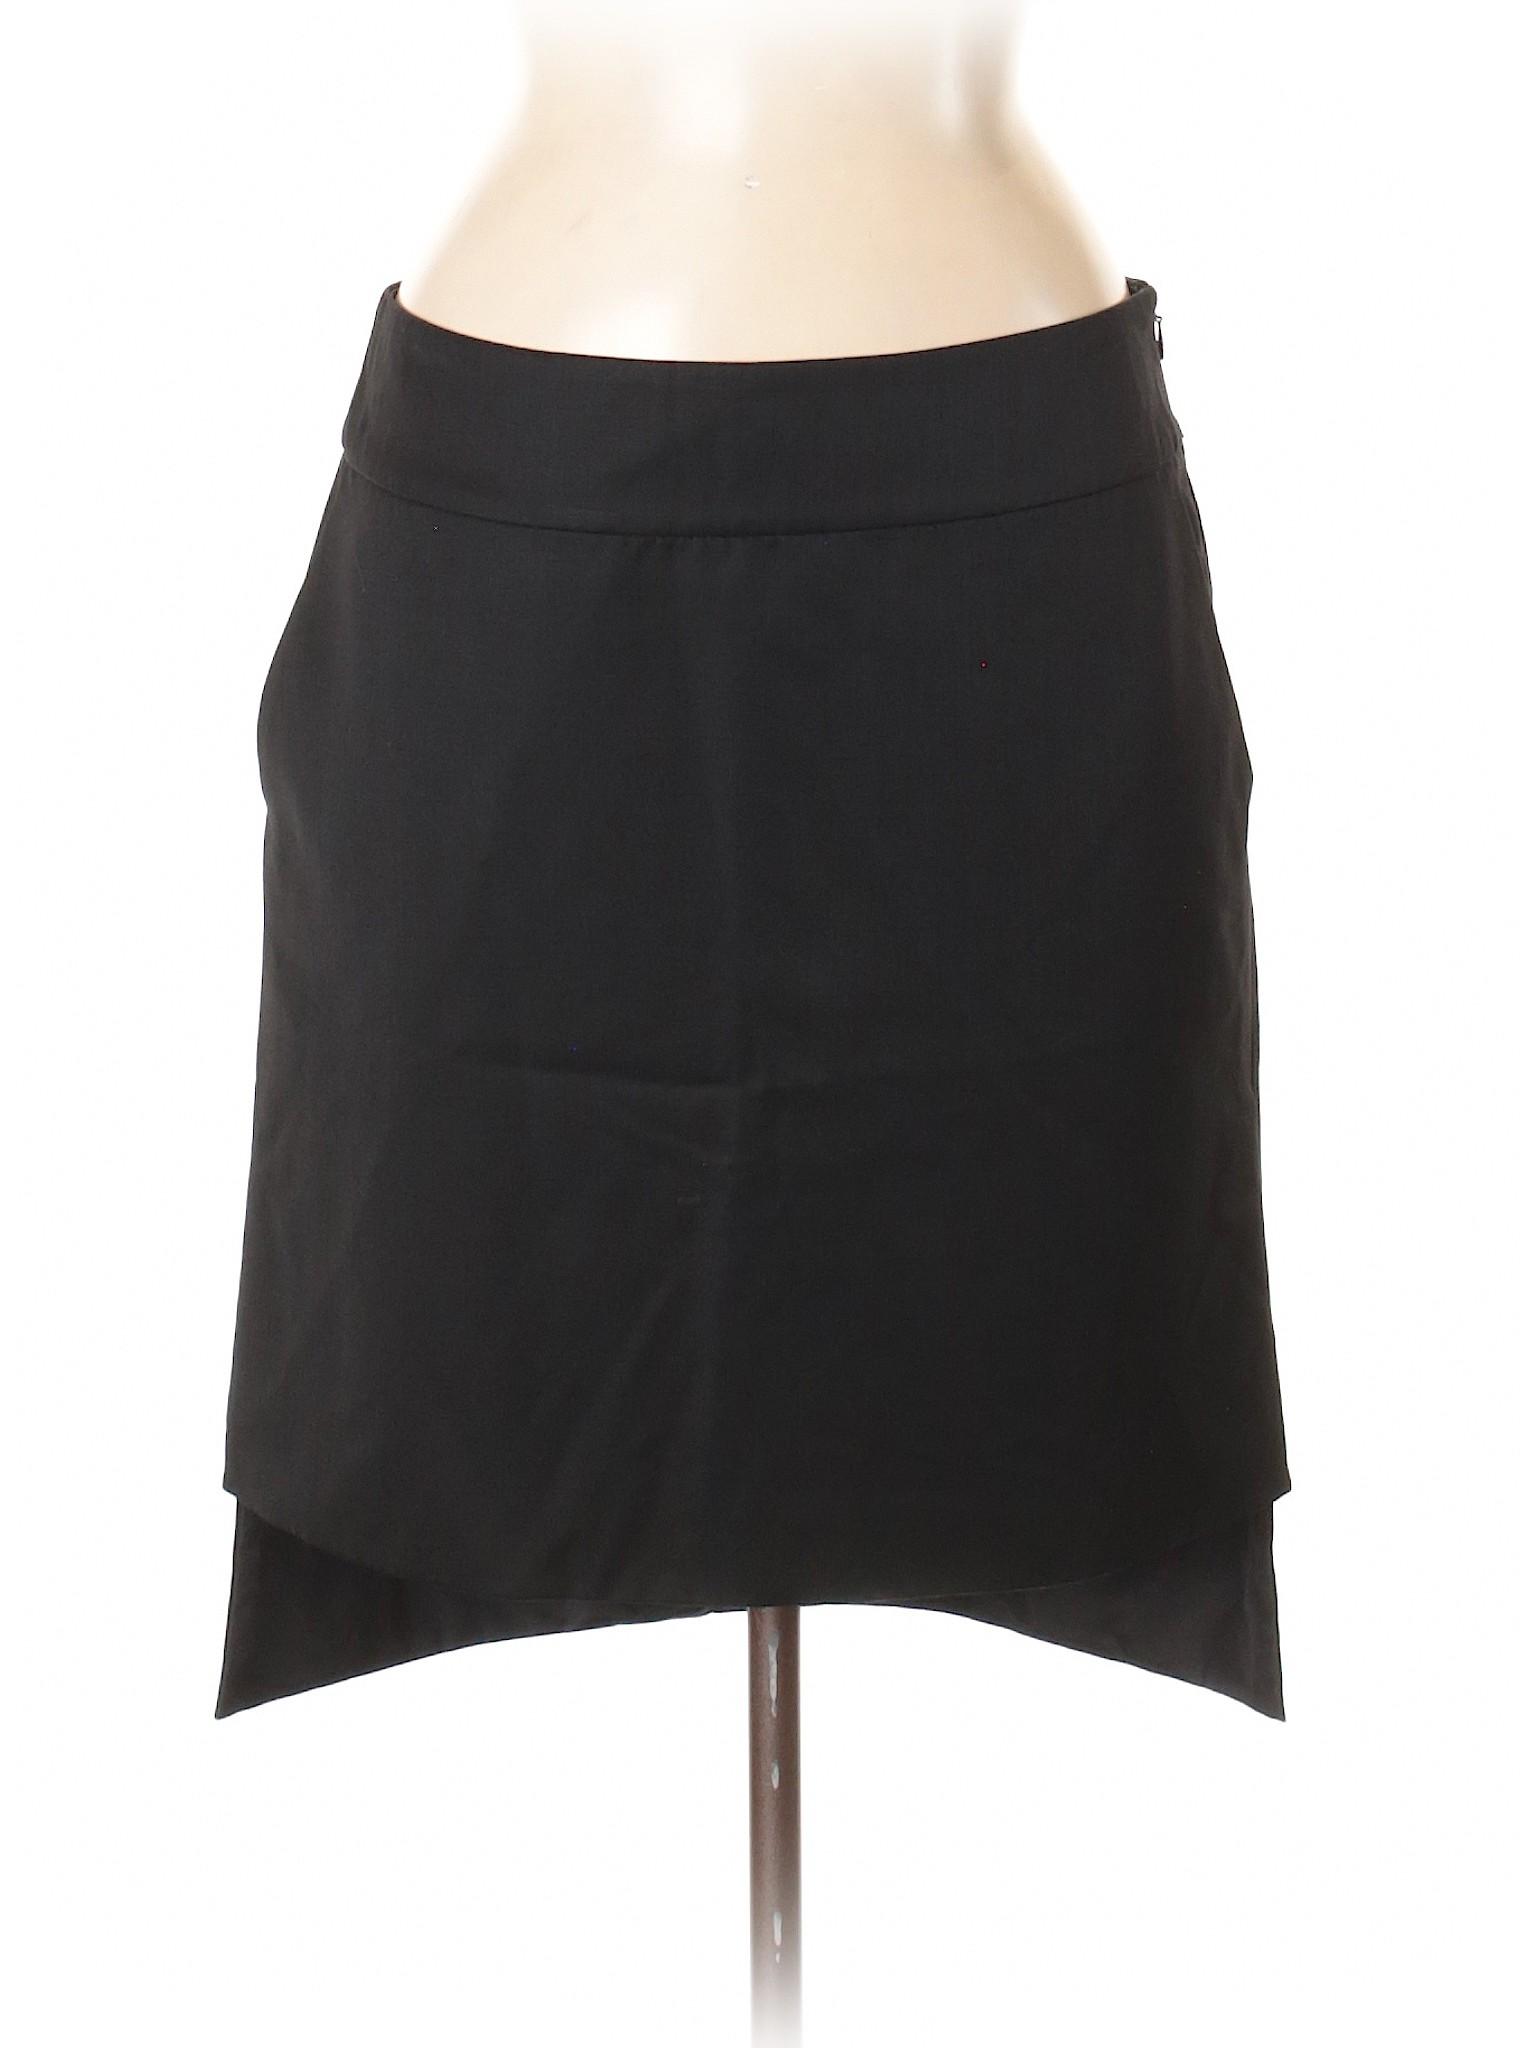 Yves Boutique Gauche Rive Skirt Laurent Saint leisure Wool 5Axqa6